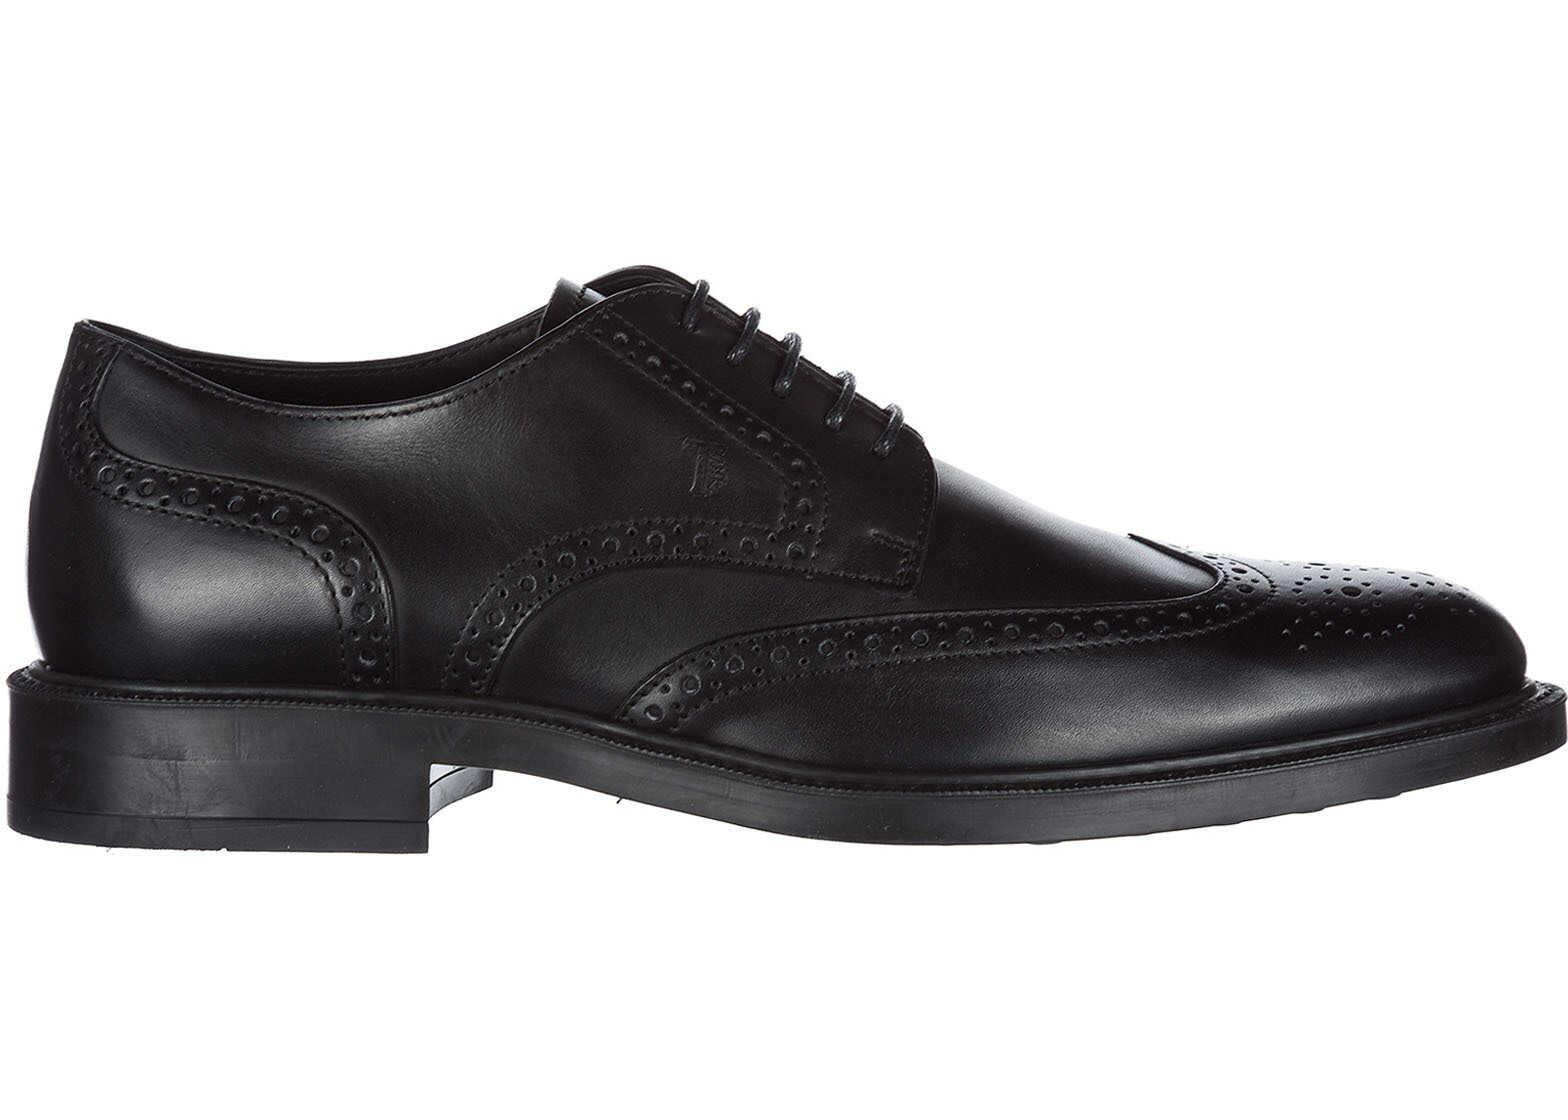 TOD'S Shoes Derby XXM45A00C10D90B999 Black imagine b-mall.ro